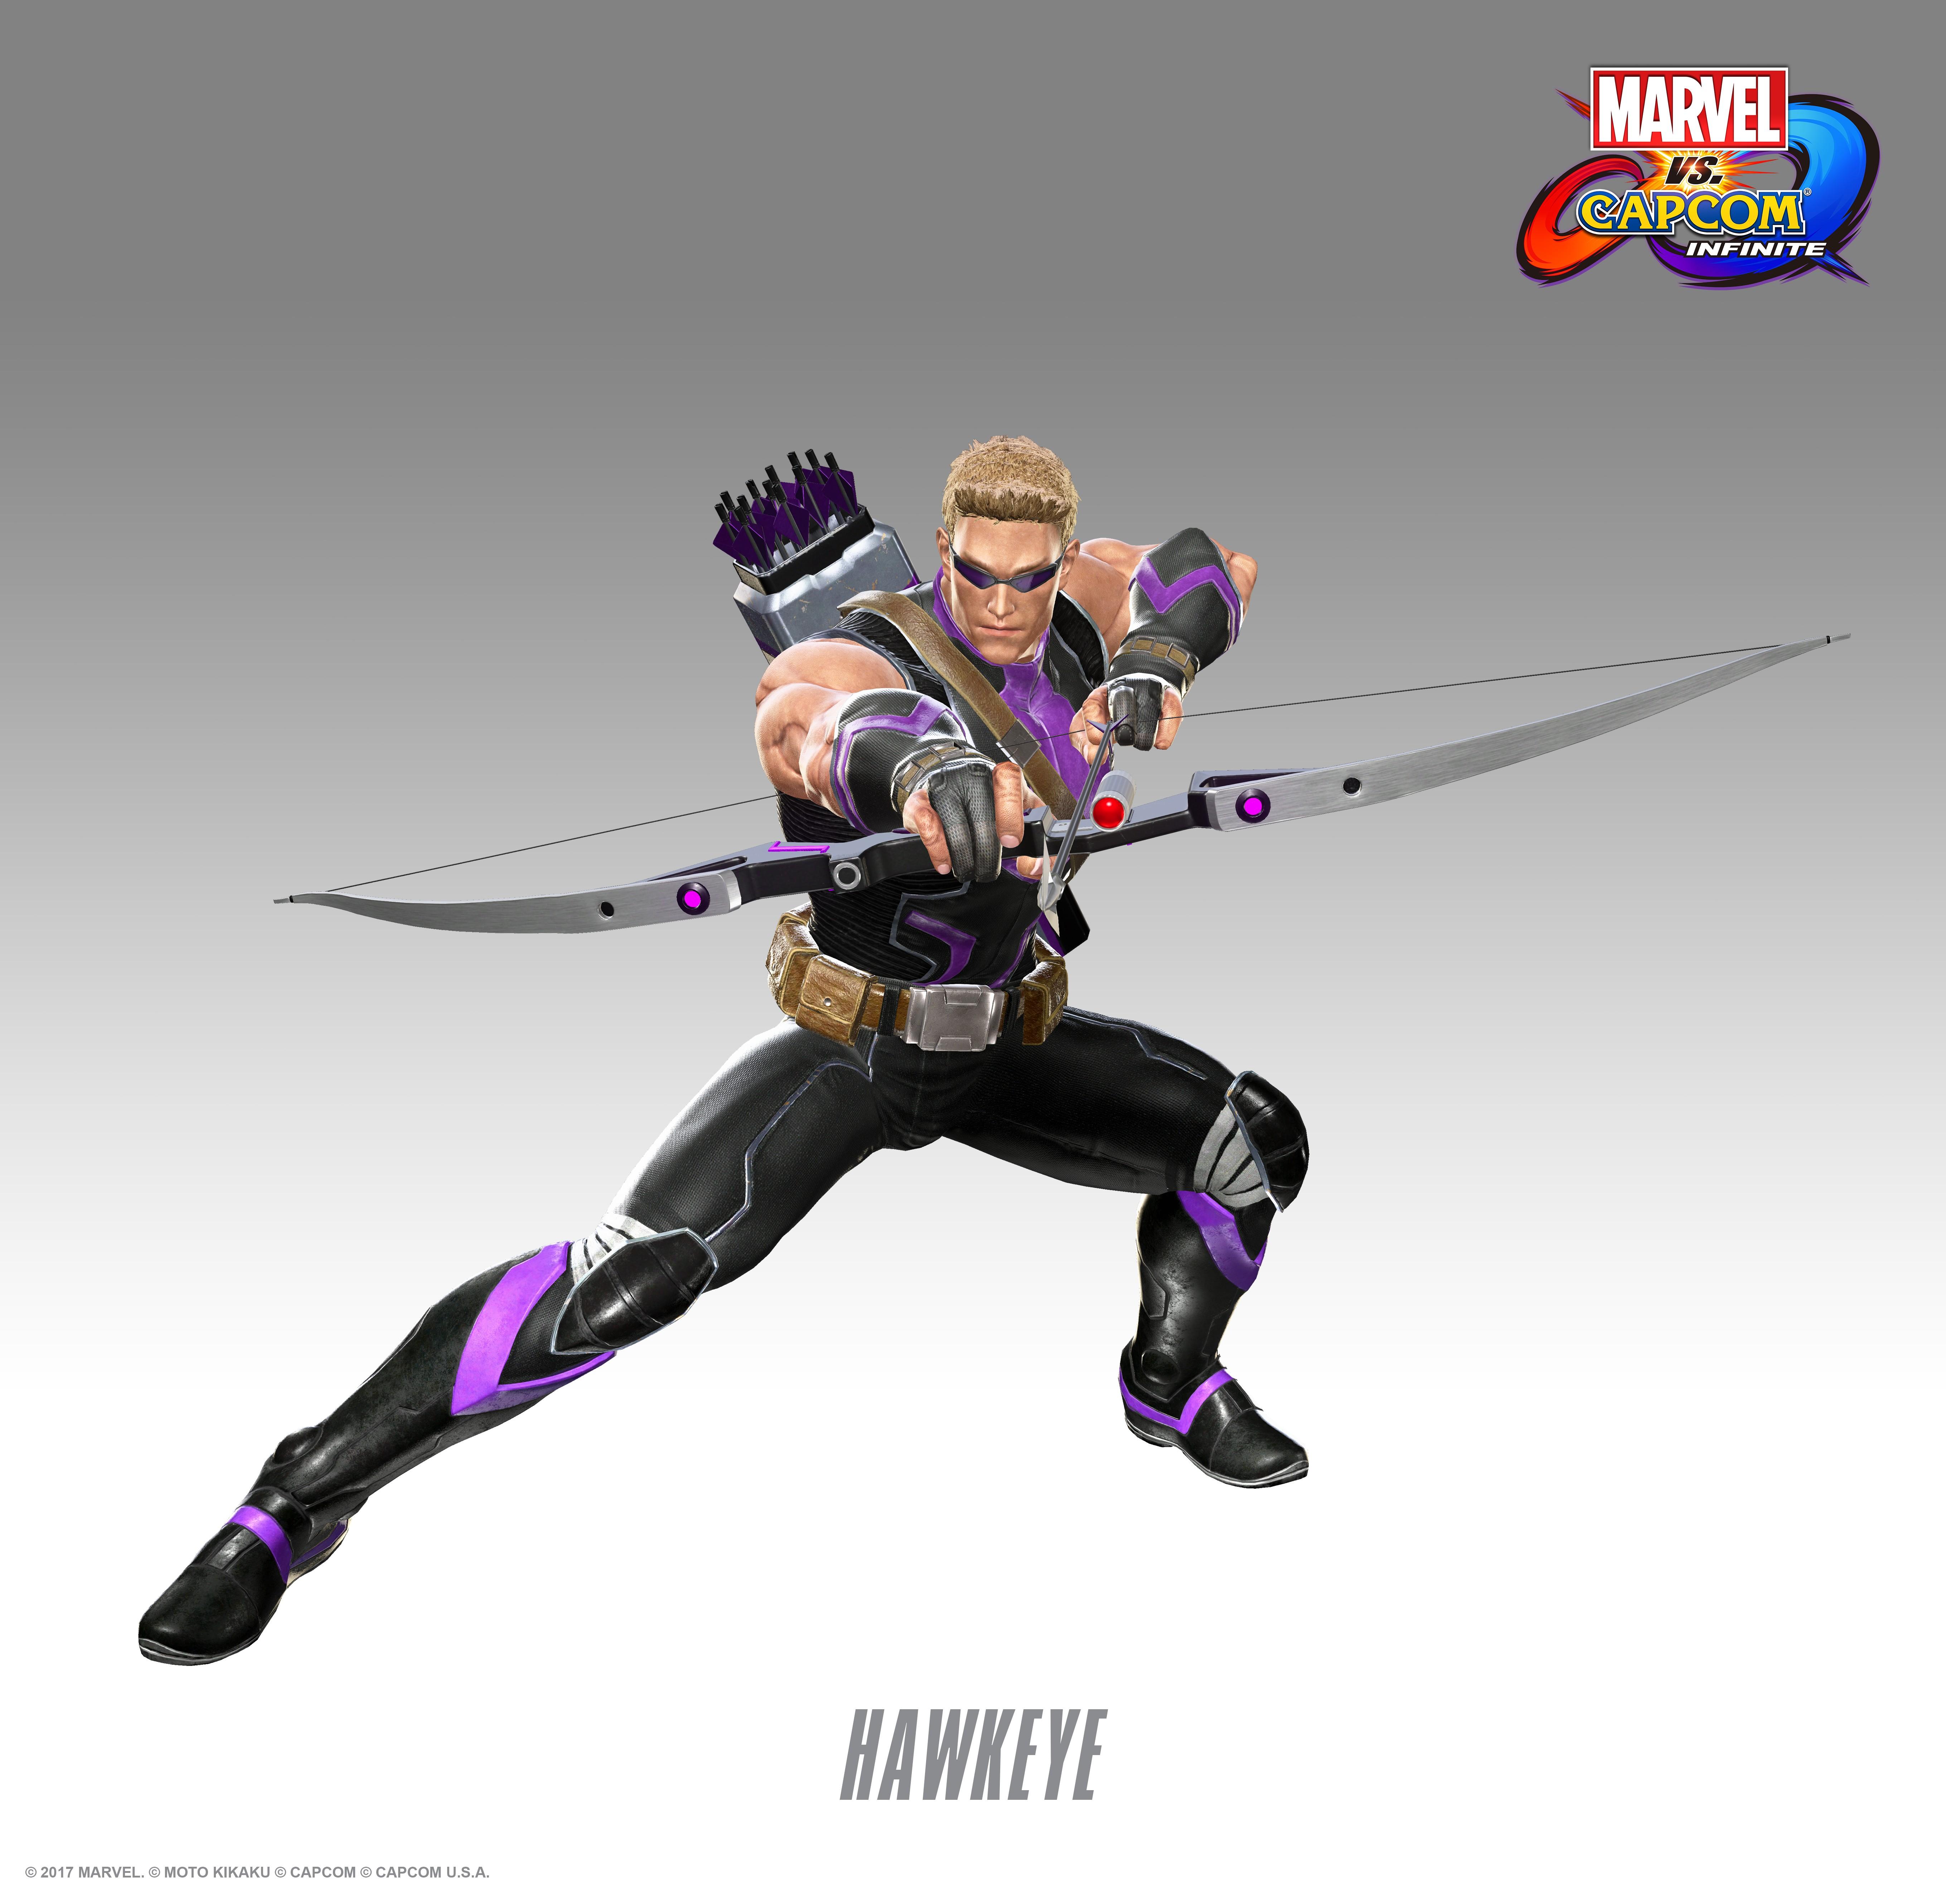 Соколиный глаз - Marvel vs. Capcom: Infinite Арт, Персонаж